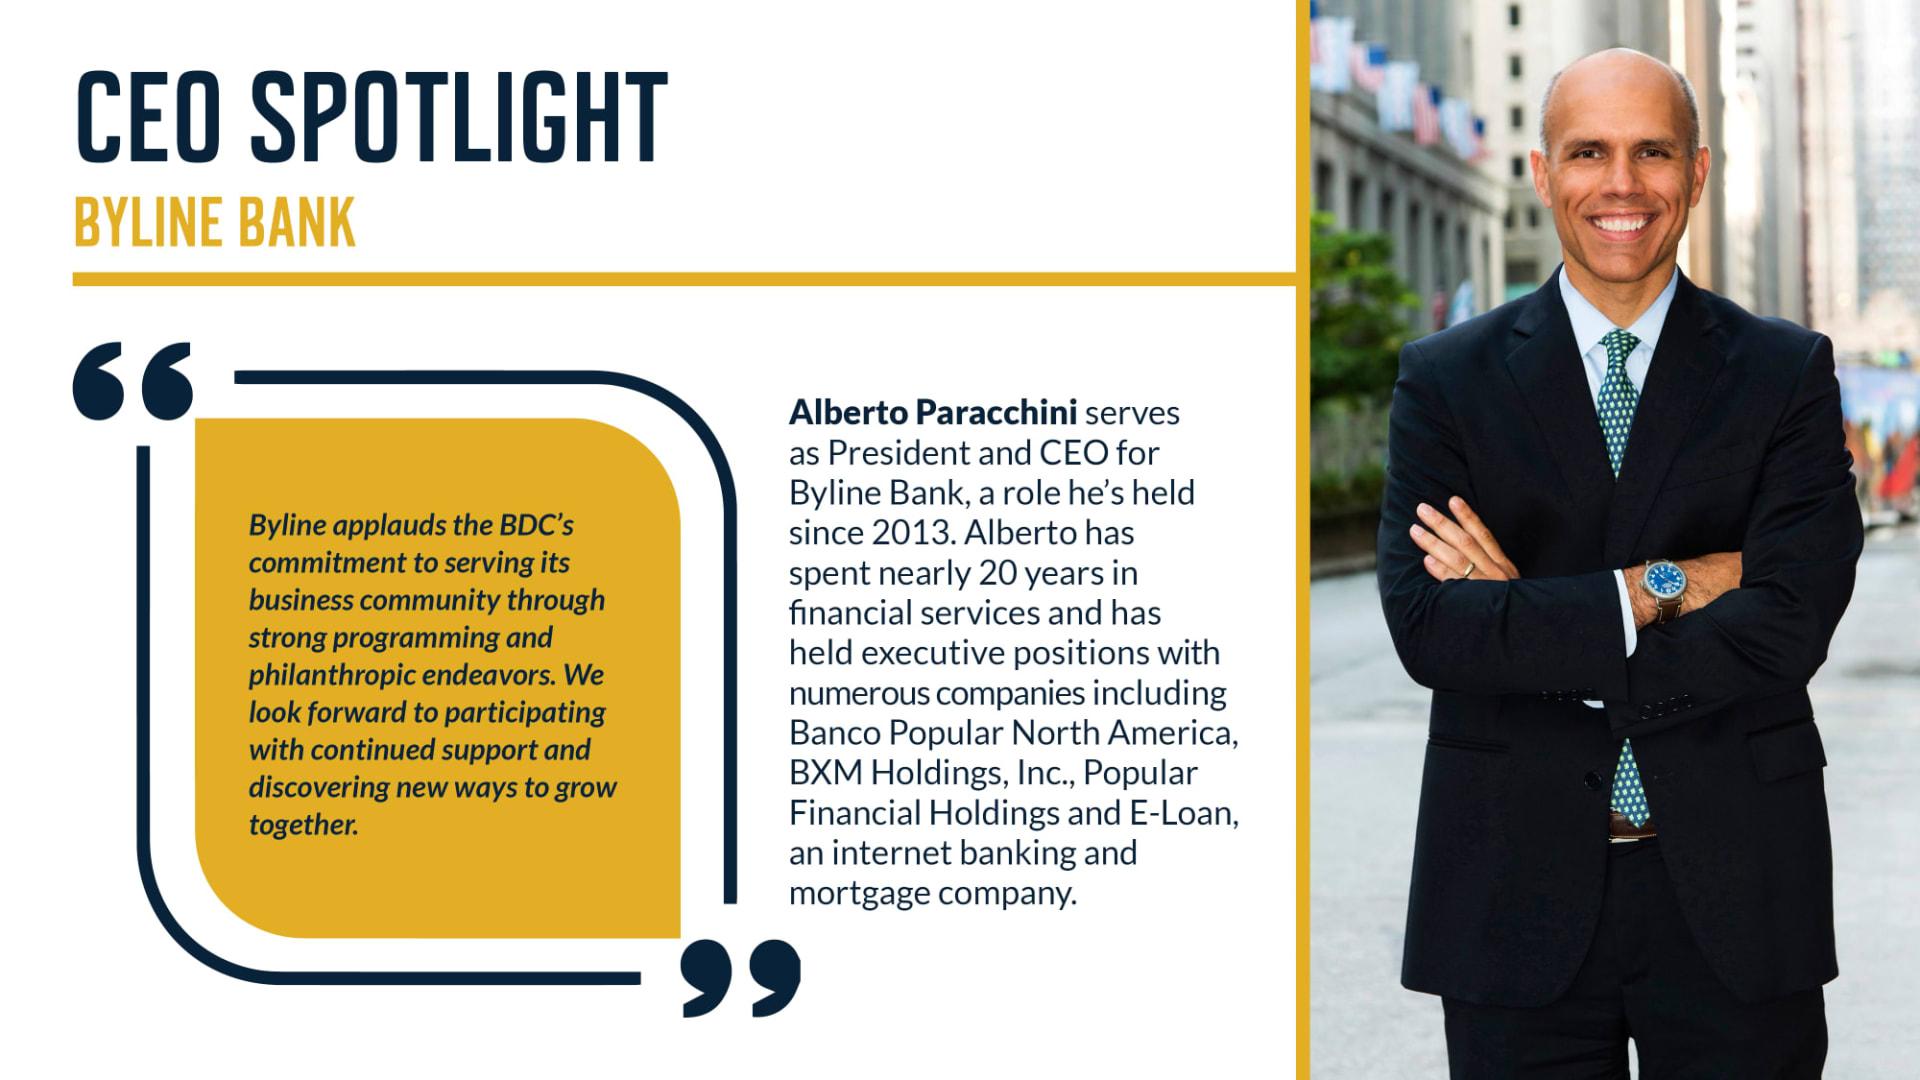 CEO-Spotlights--w2000-w1920.jpg